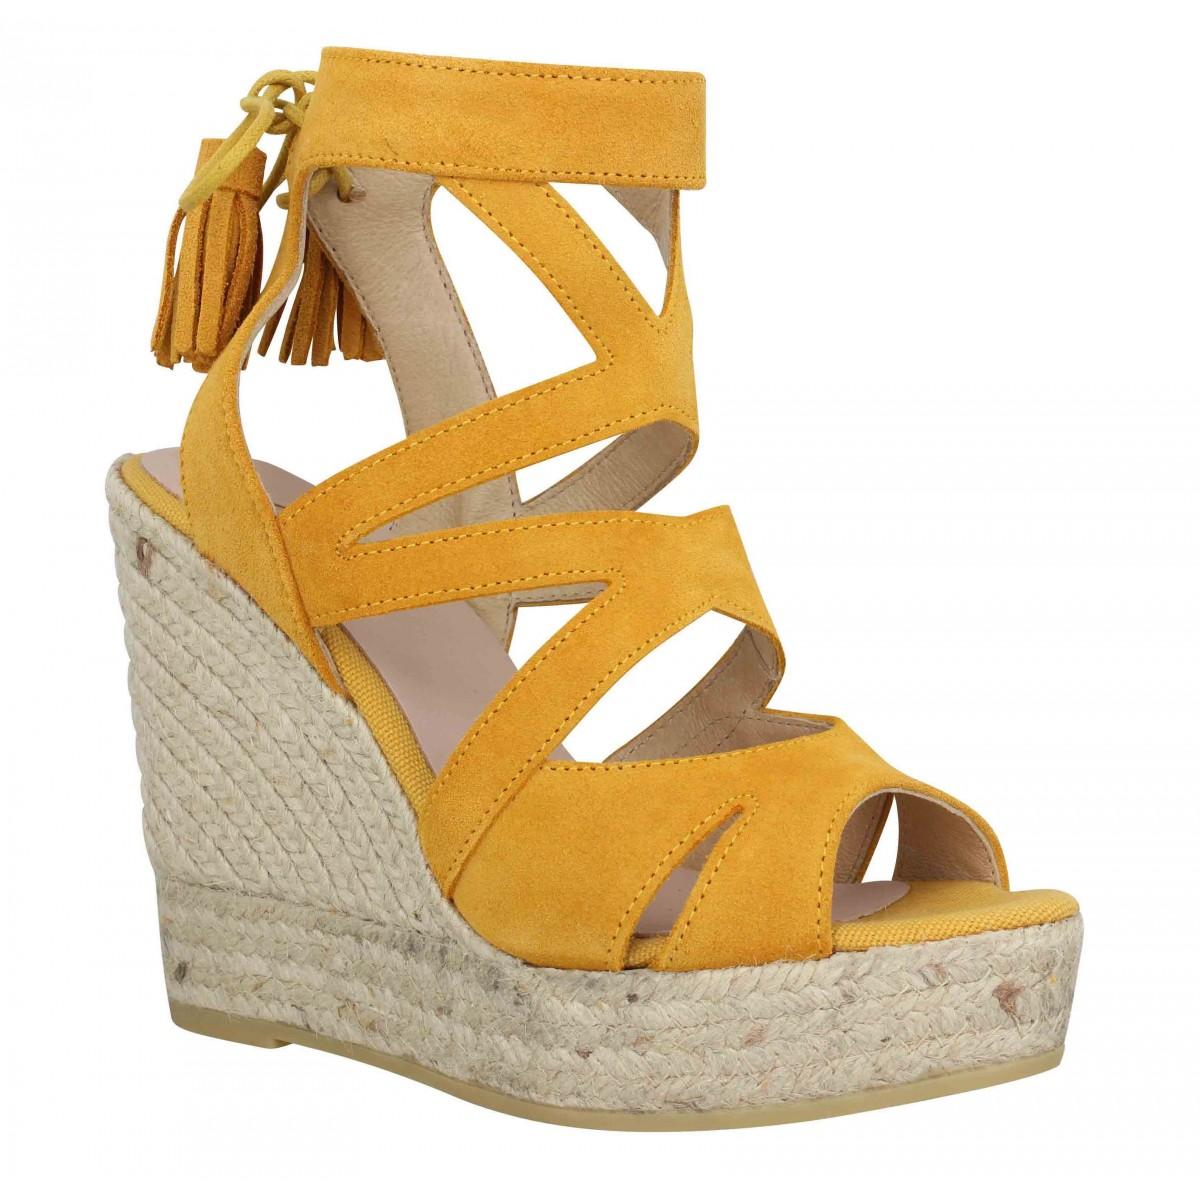 JauneFanny Femme 6022 Velours Kanna Chaussures UVpSMGqz